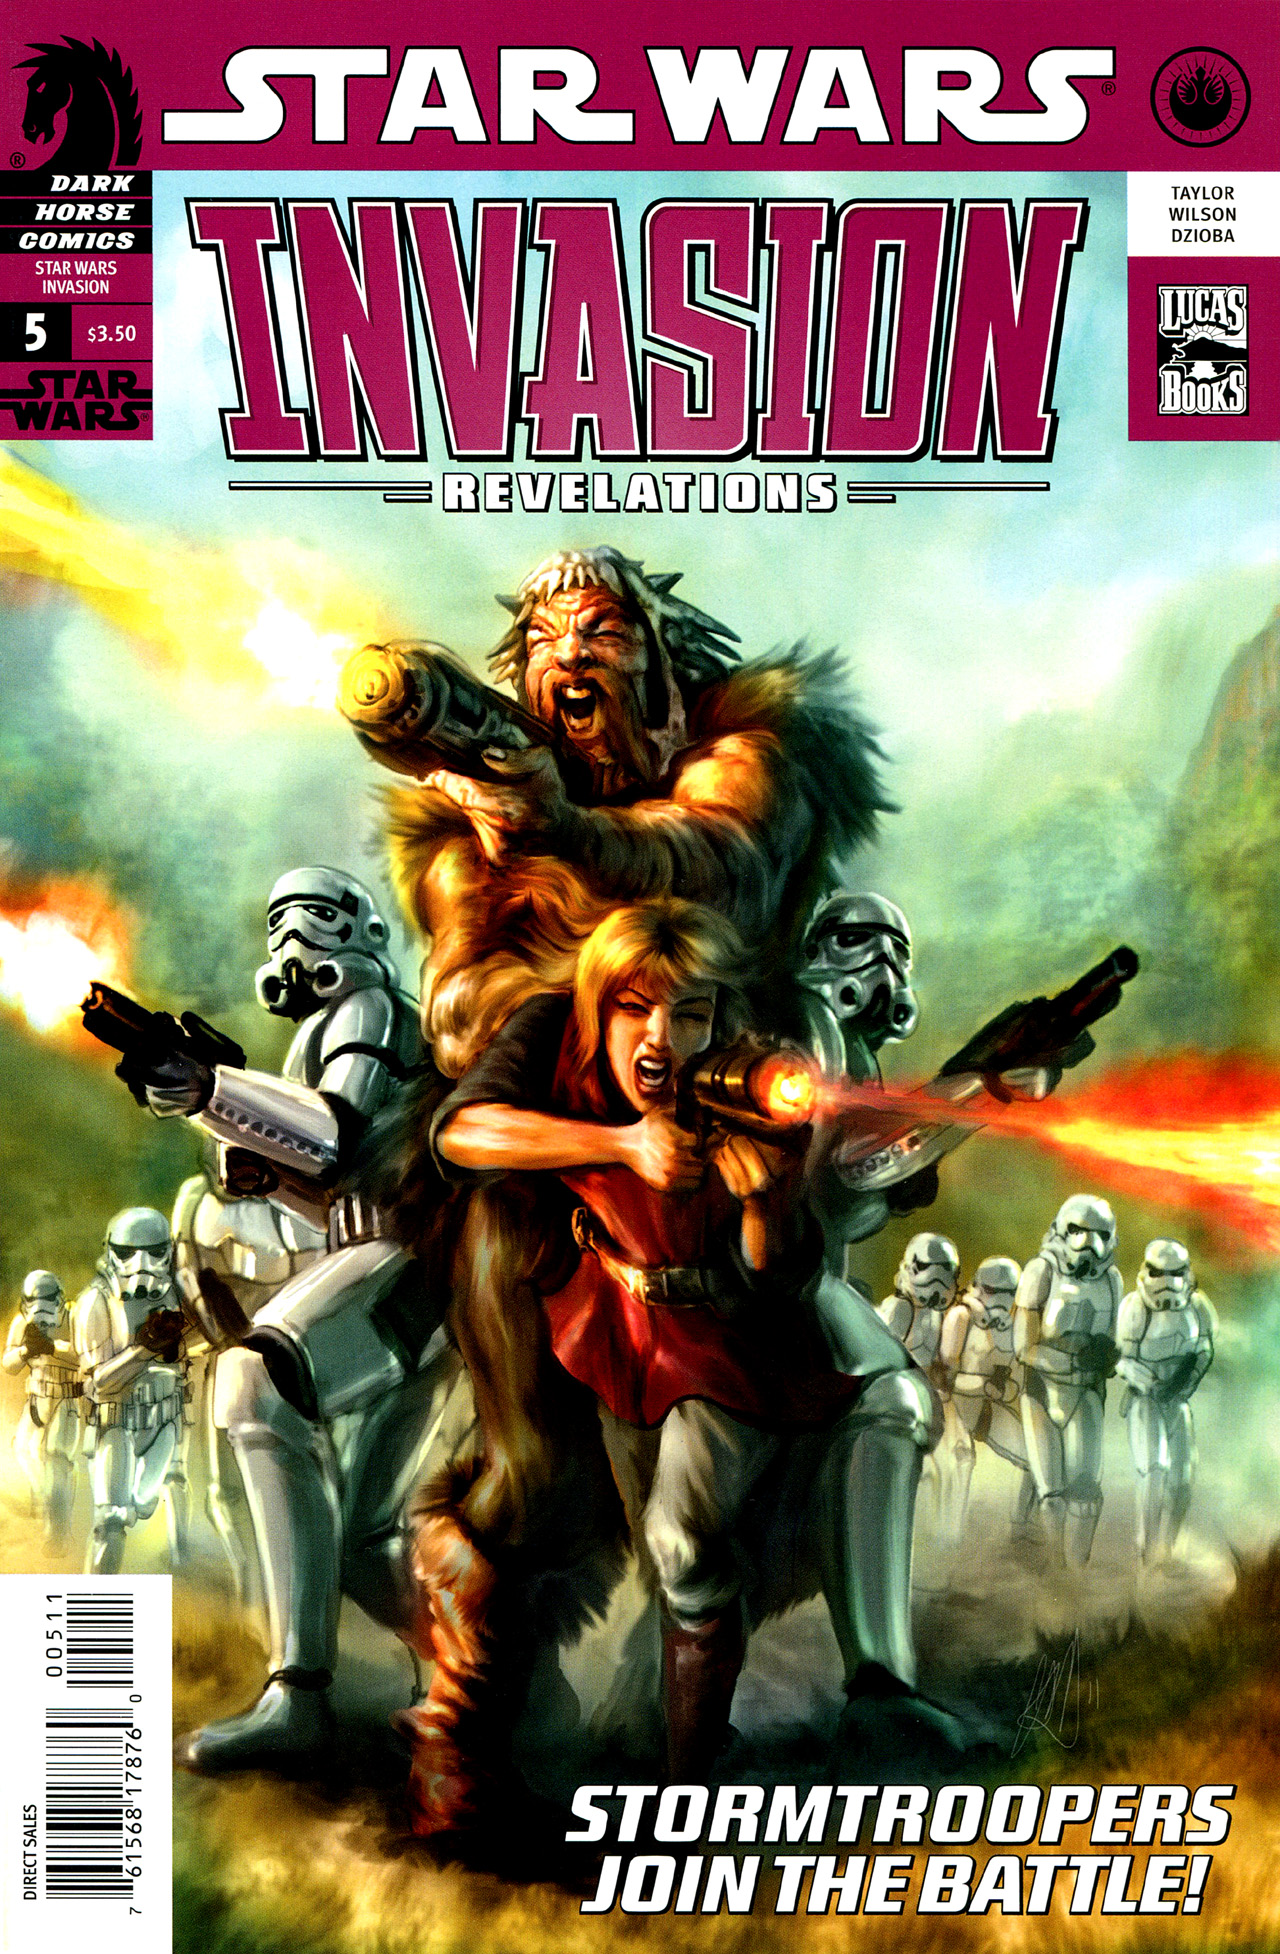 Star Wars: Invasion - Revelations 5 Page 1